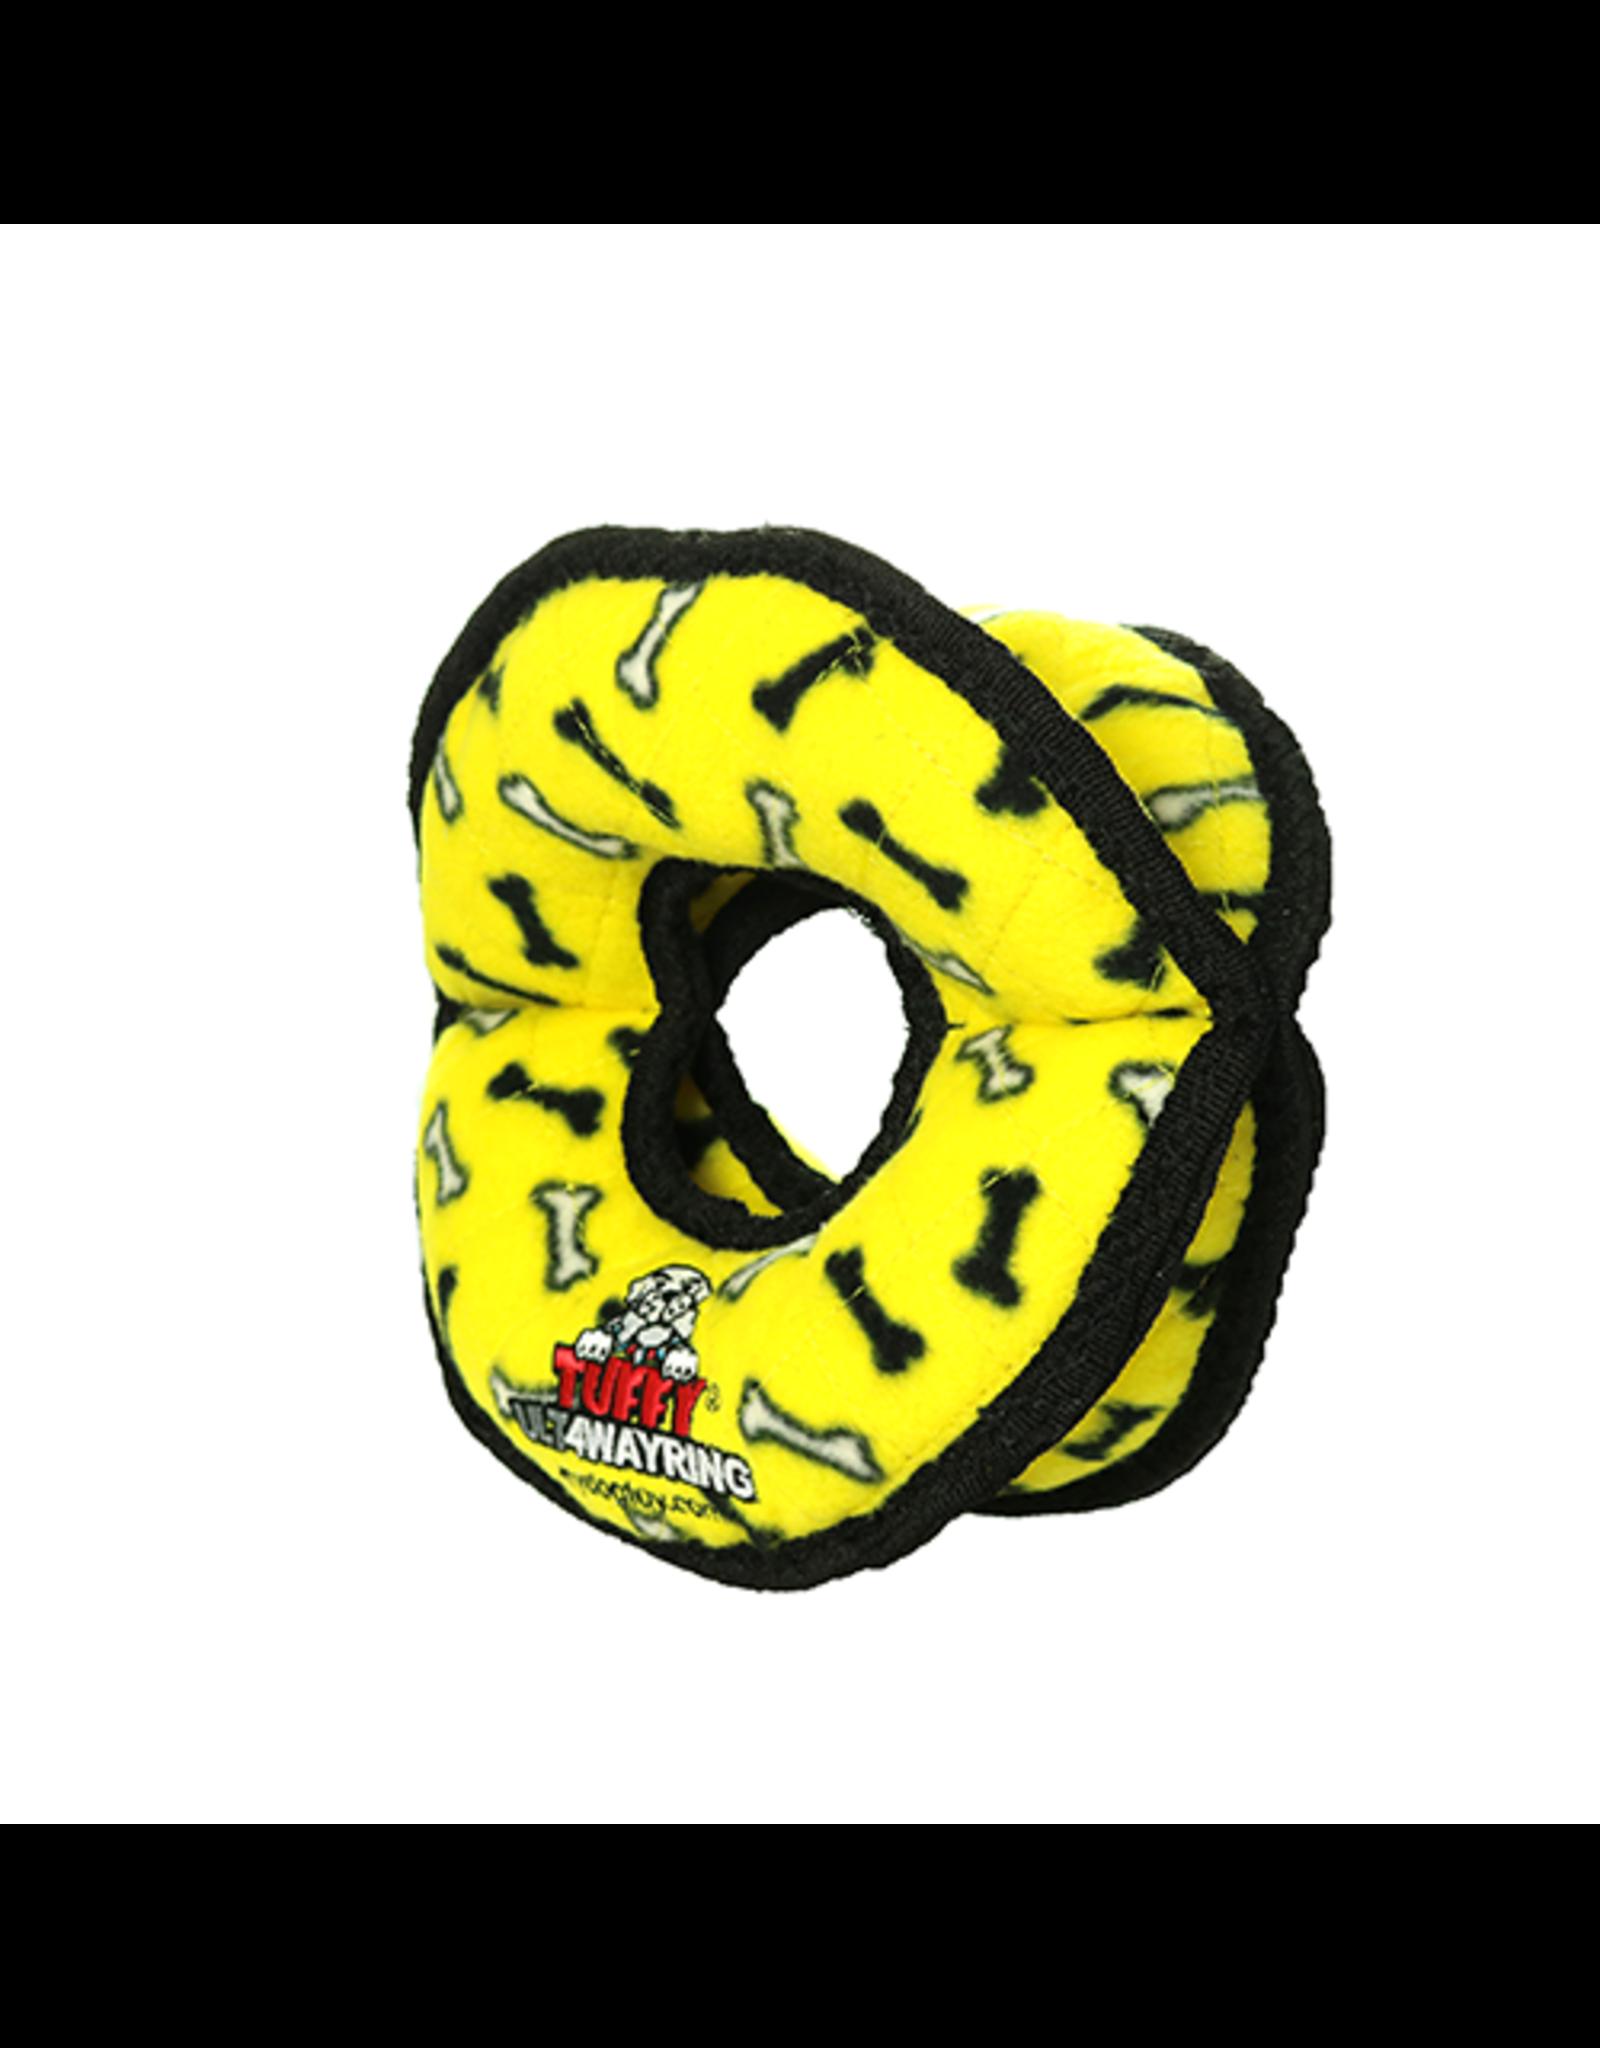 Tuffys Ultimate 4 Way Ring: Yellow,